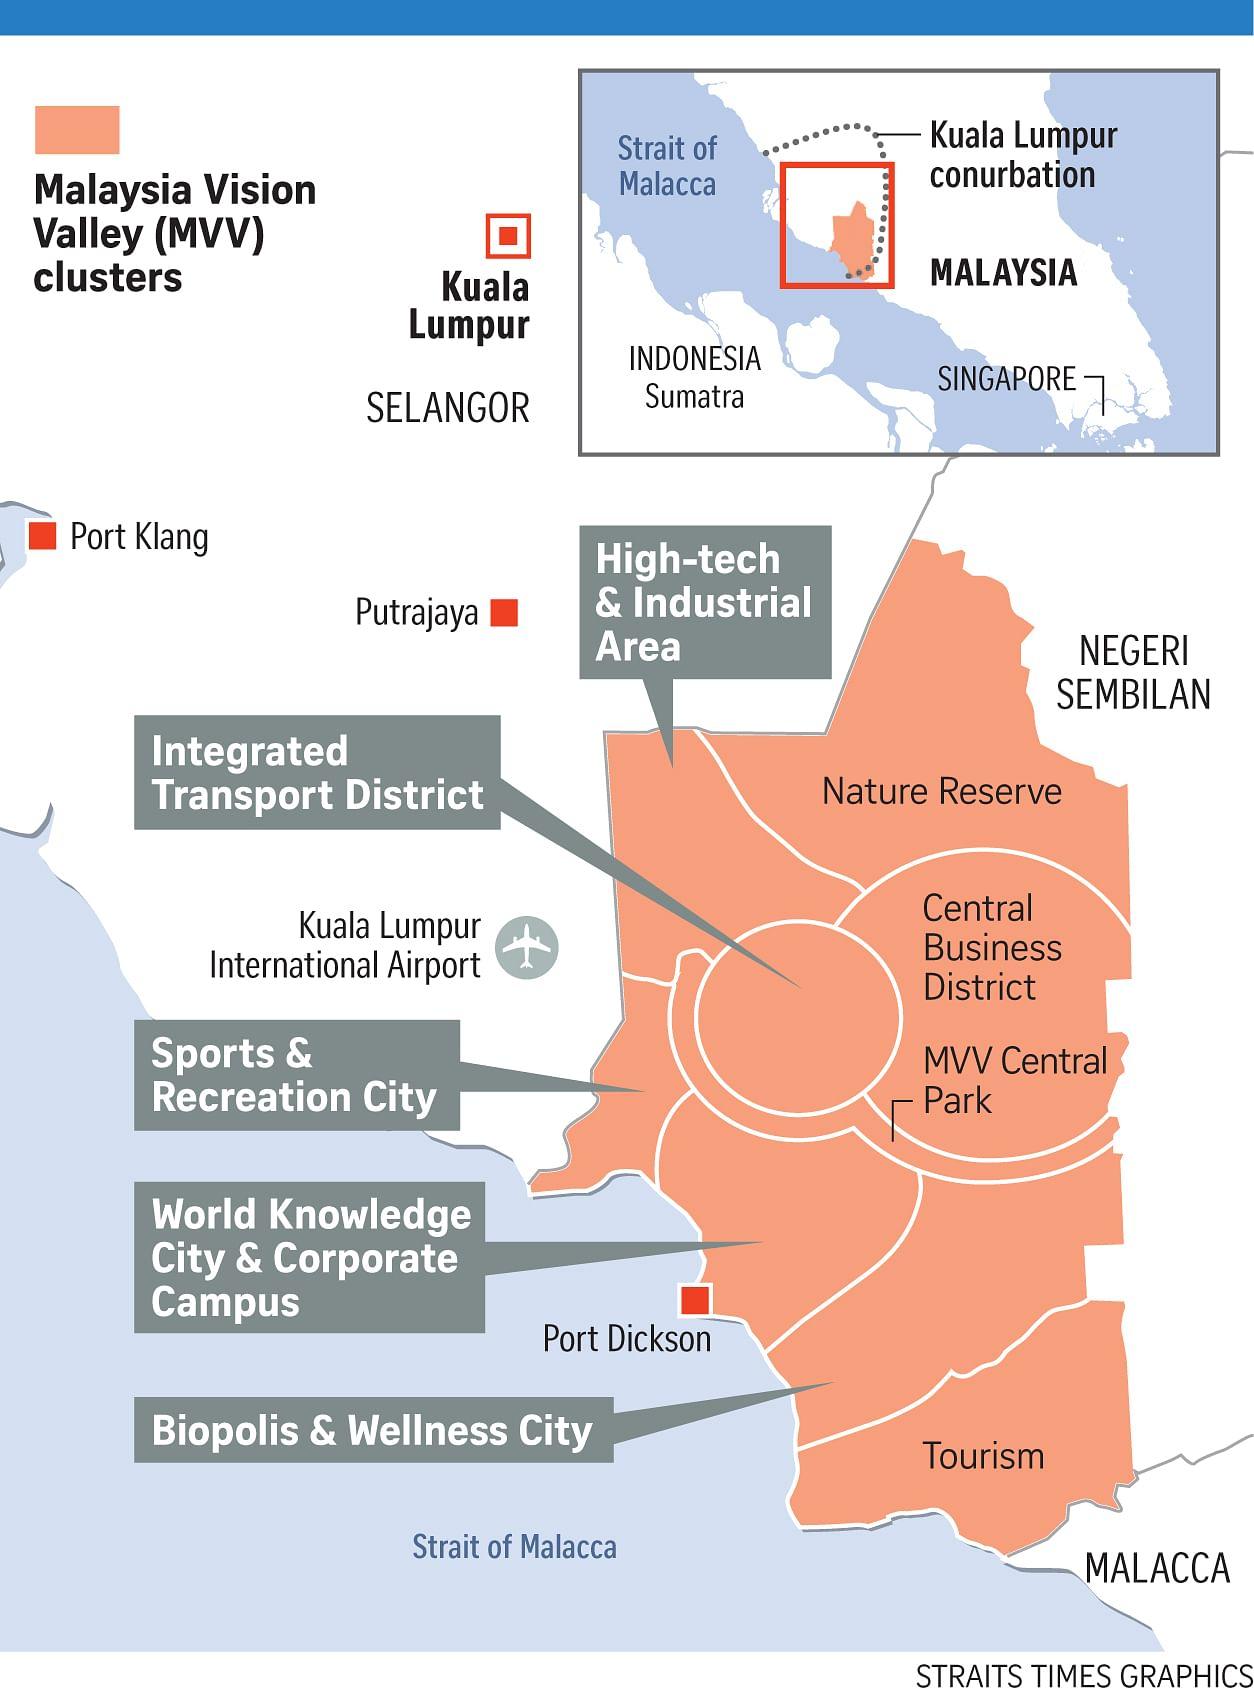 Malaysia Vision Valley 2 0 Negeri Sembilan U C Page 3